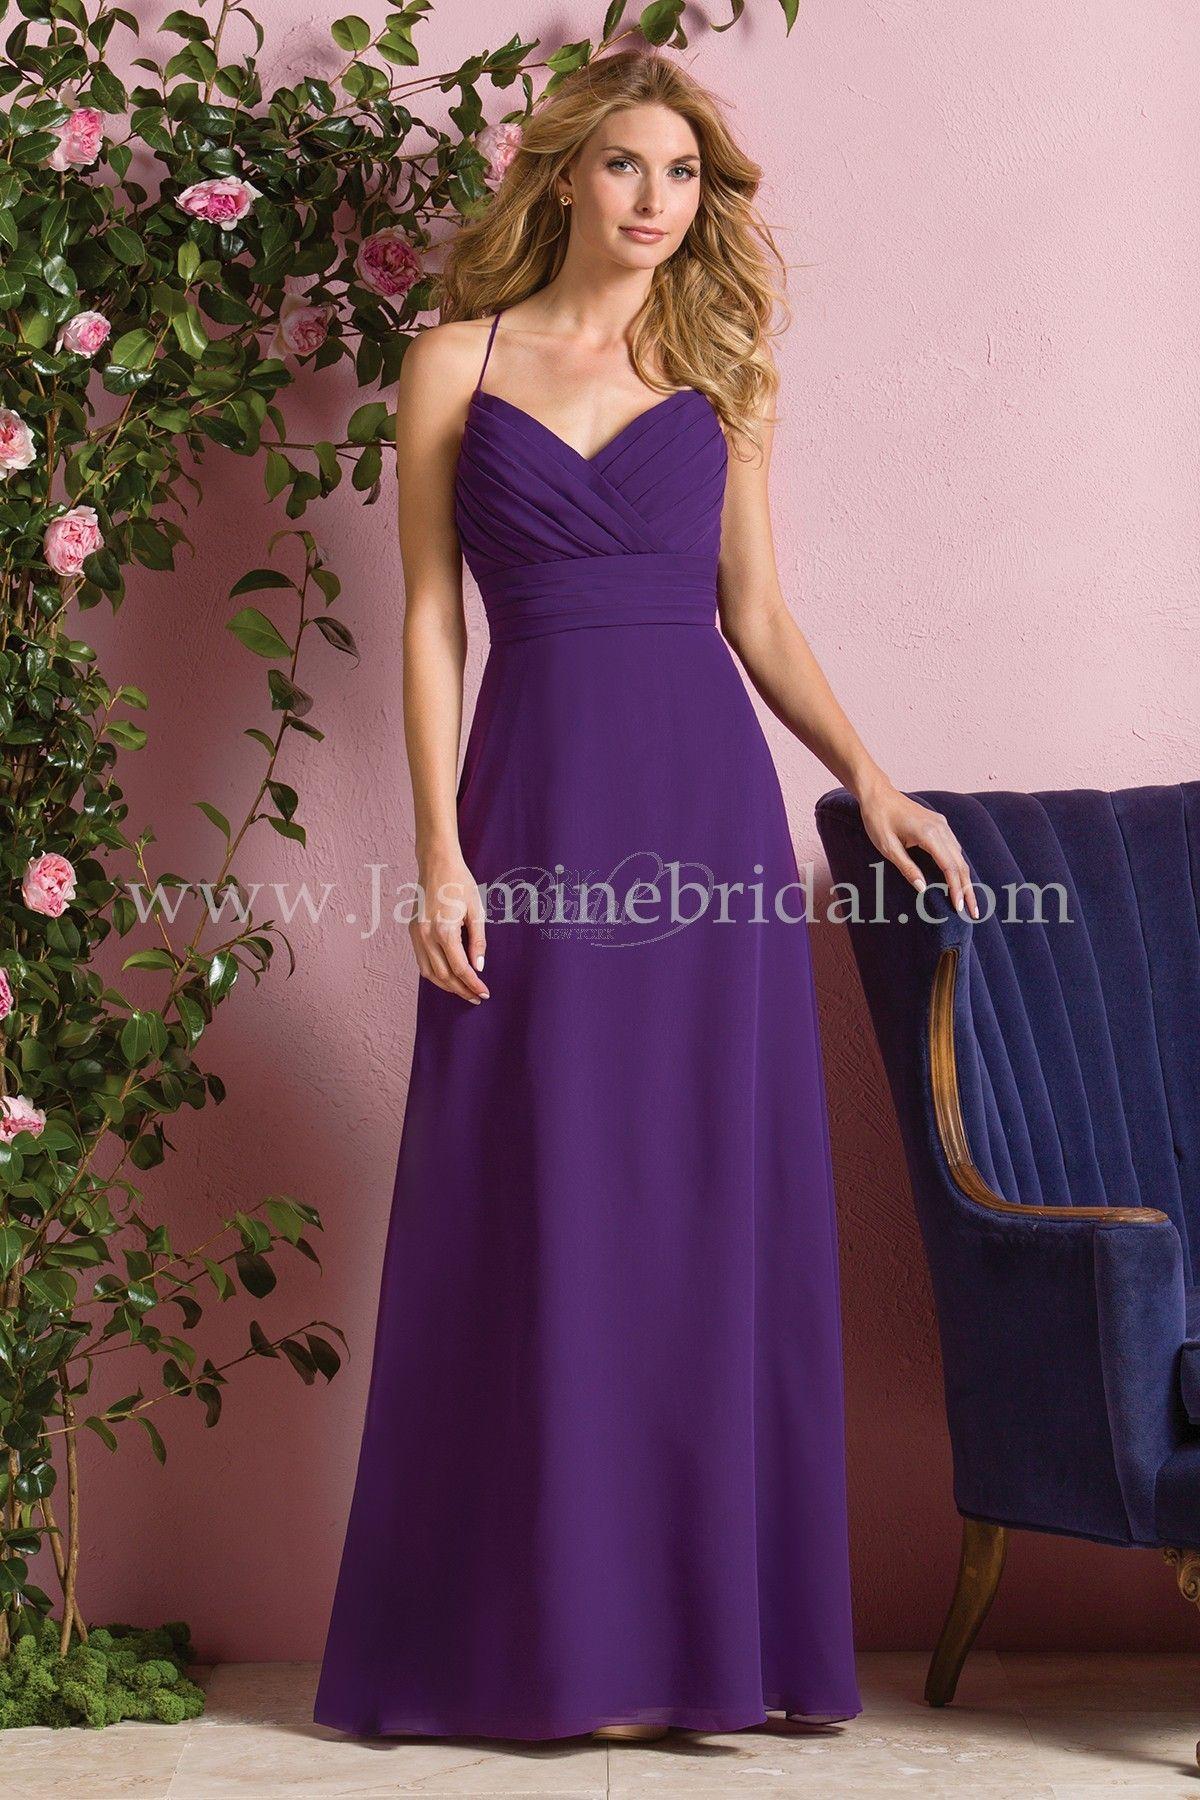 B by jasmine spring style b bridesmaid stuff